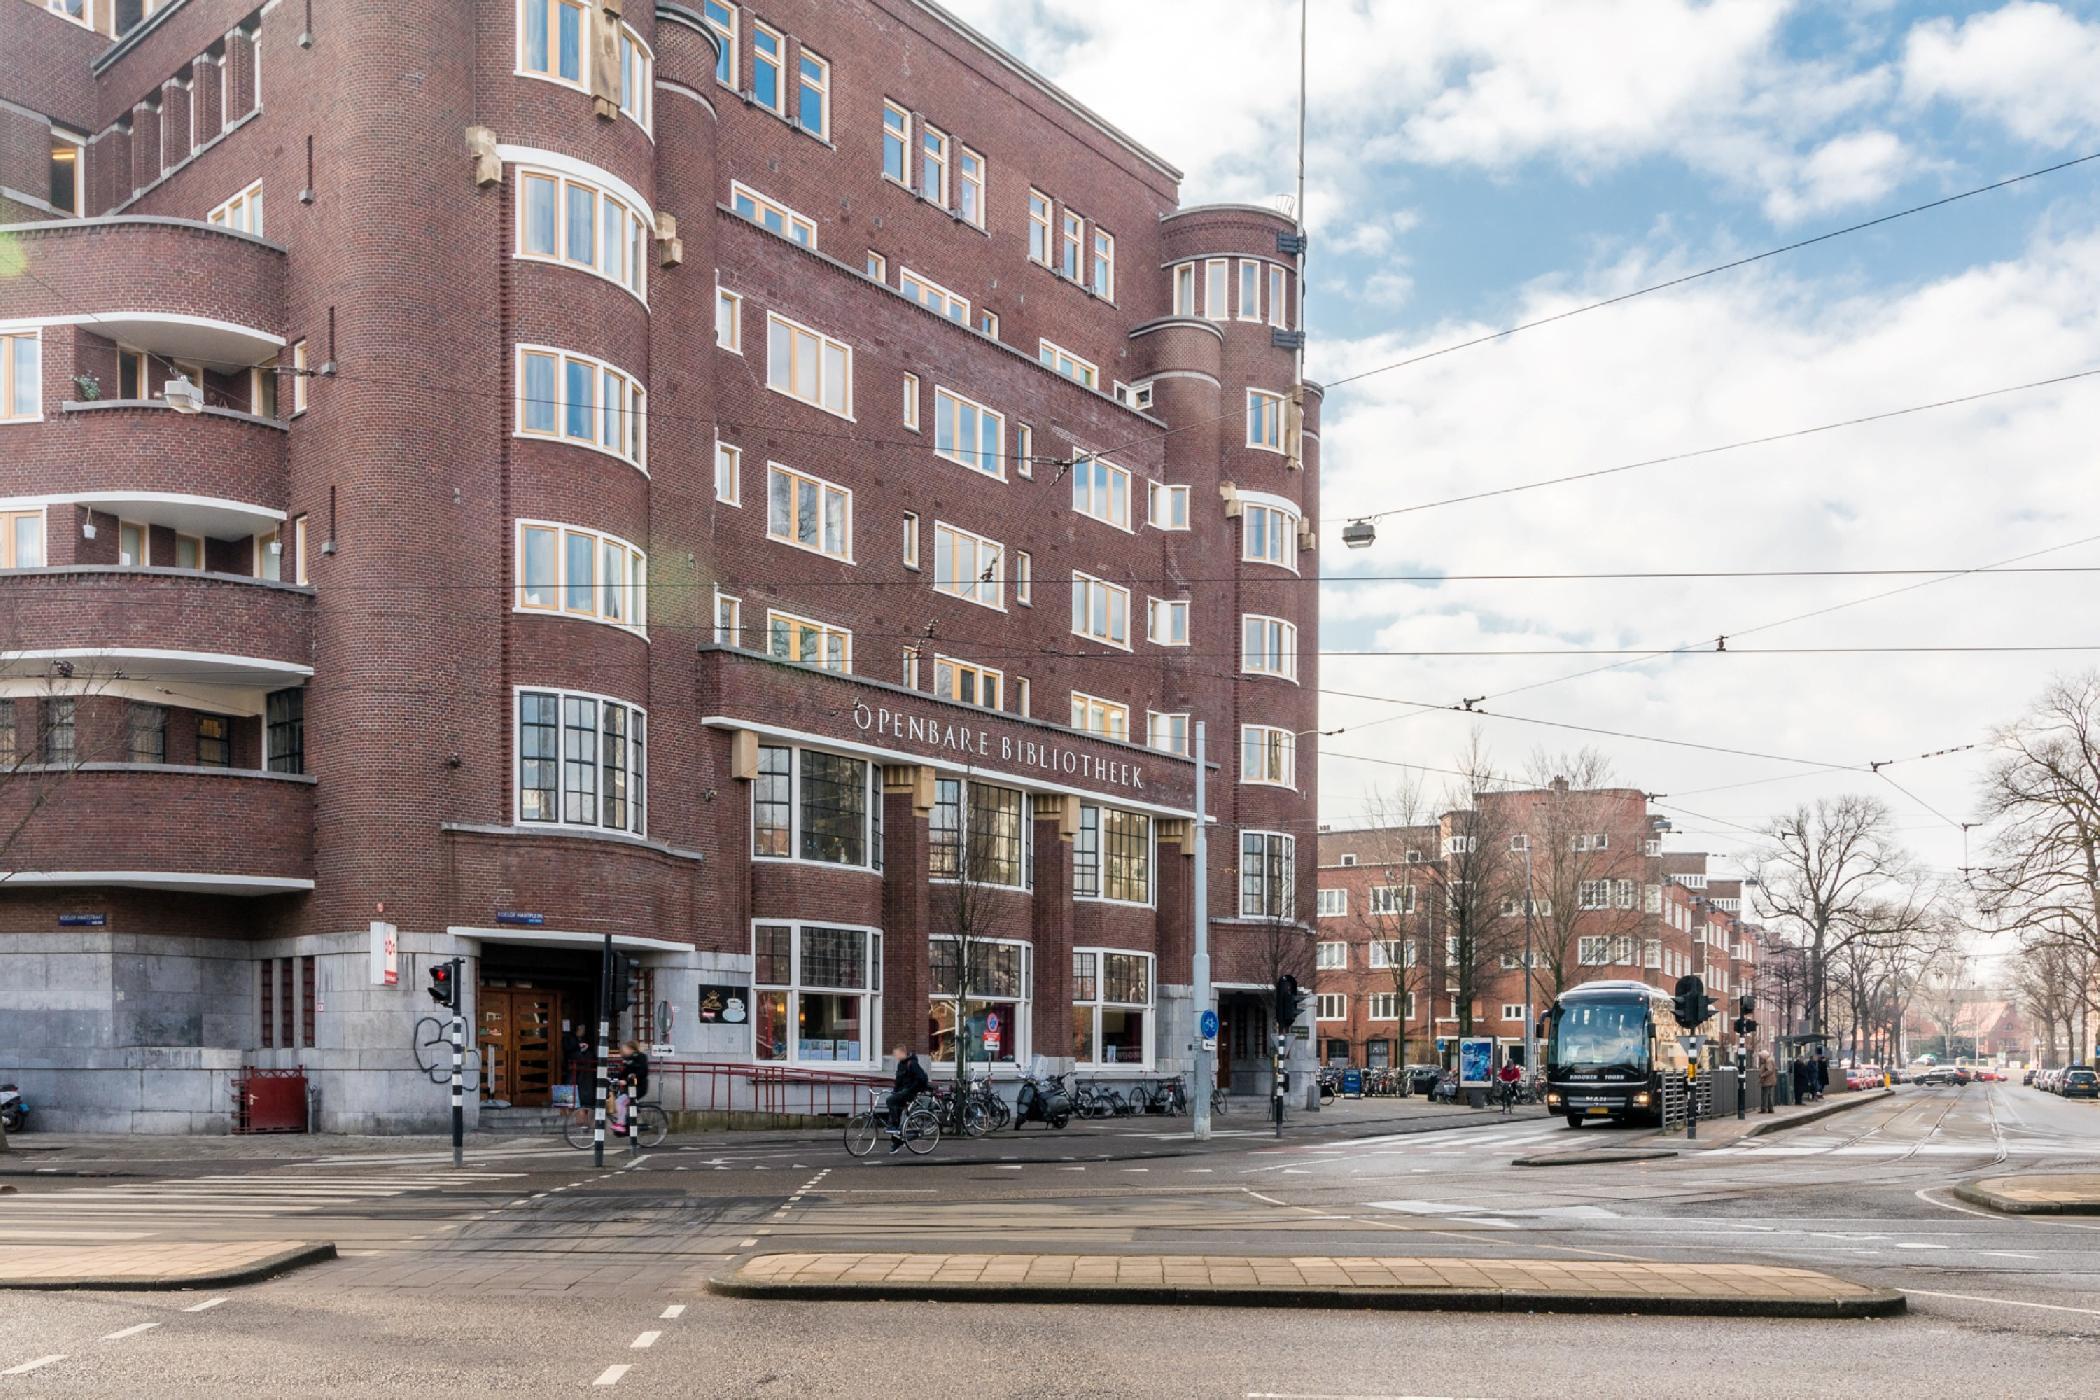 2018 03 07 - bookingmanager - hartplein 17-3 te amsterdam  30 of 31  jpg